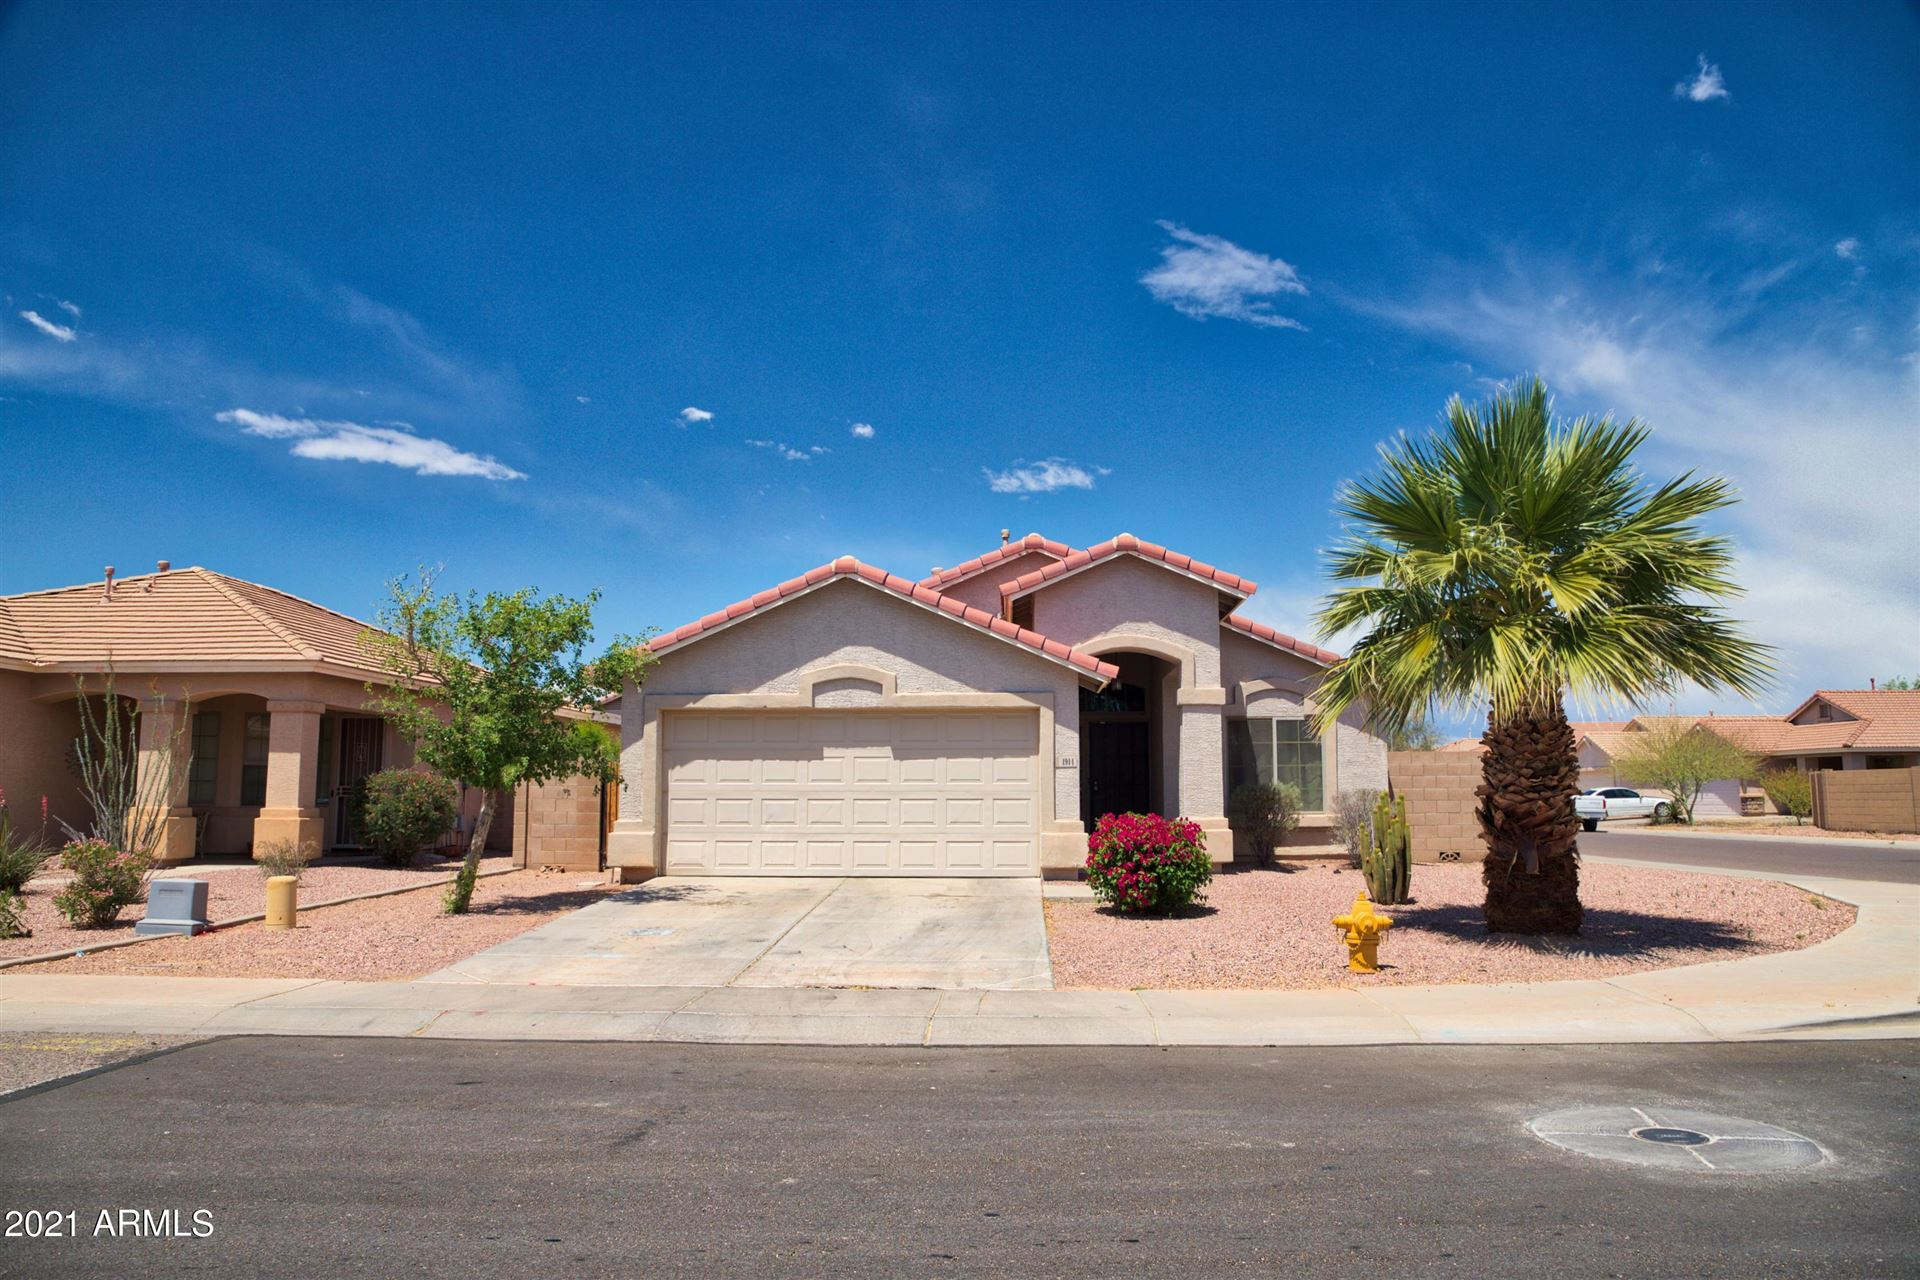 Photo of 4914 W NOVAK Way, Laveen, AZ 85339 (MLS # 6231759)